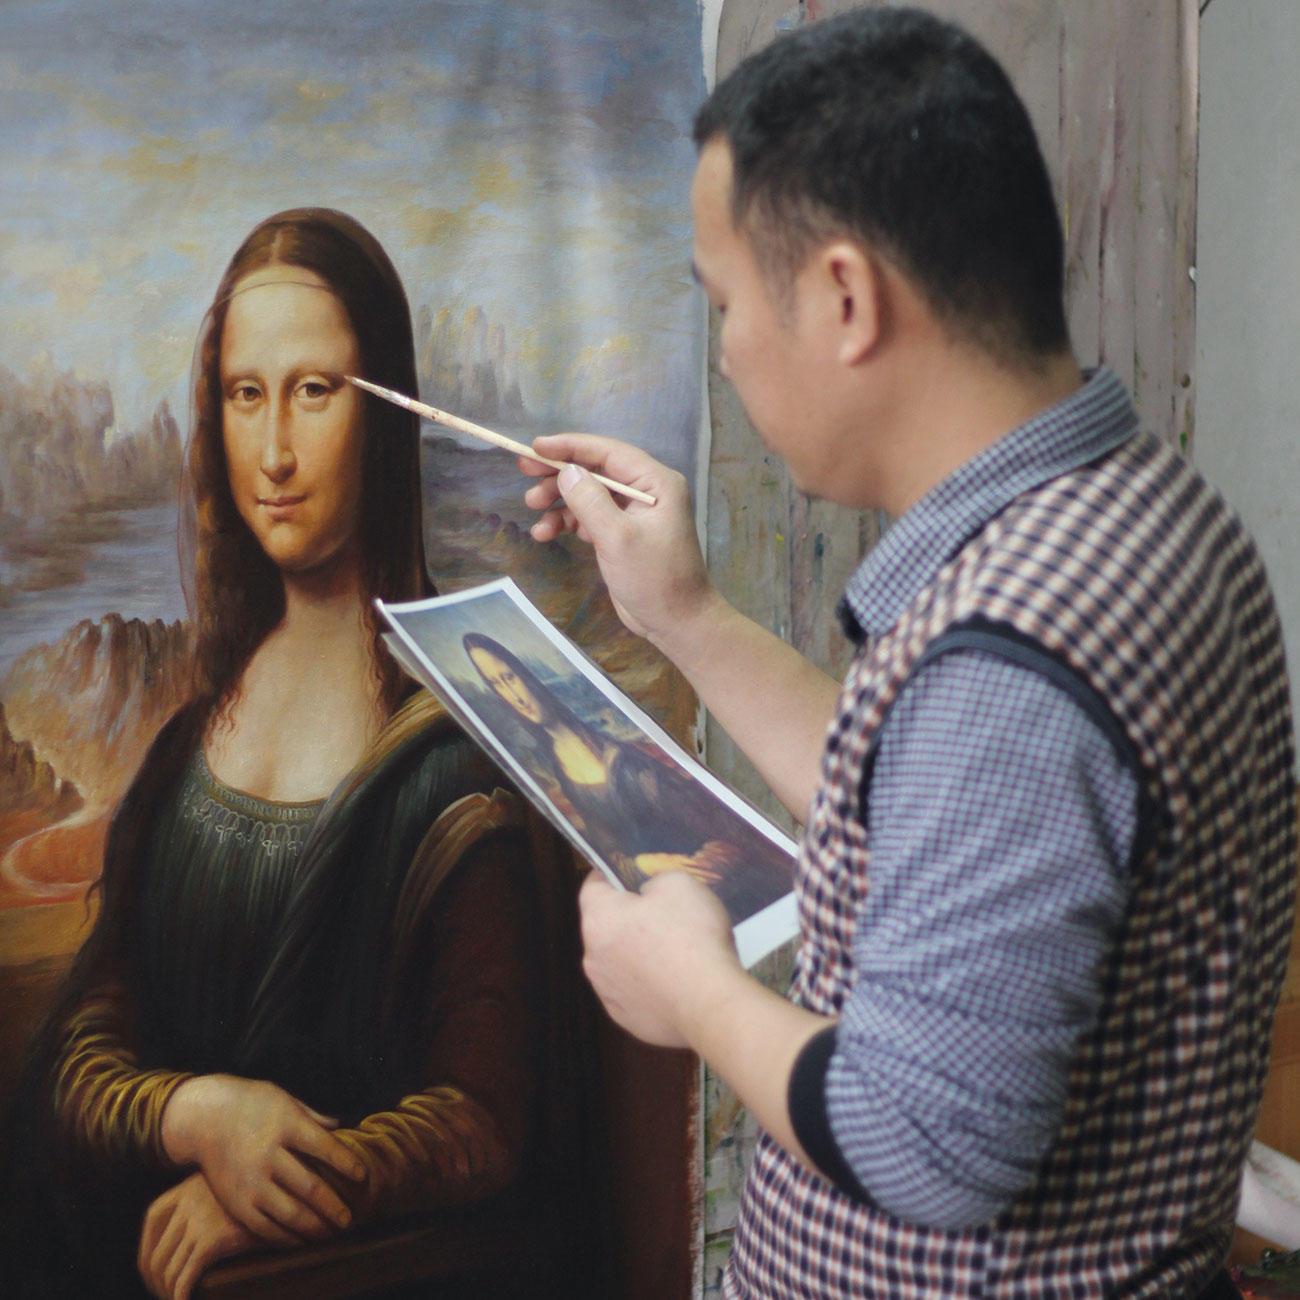 Hui Liu Malt Leonardo Da Vinci – Mona Lisa in Wann Hat Leonardo Da Vinci Die Mona Lisa Gemalt